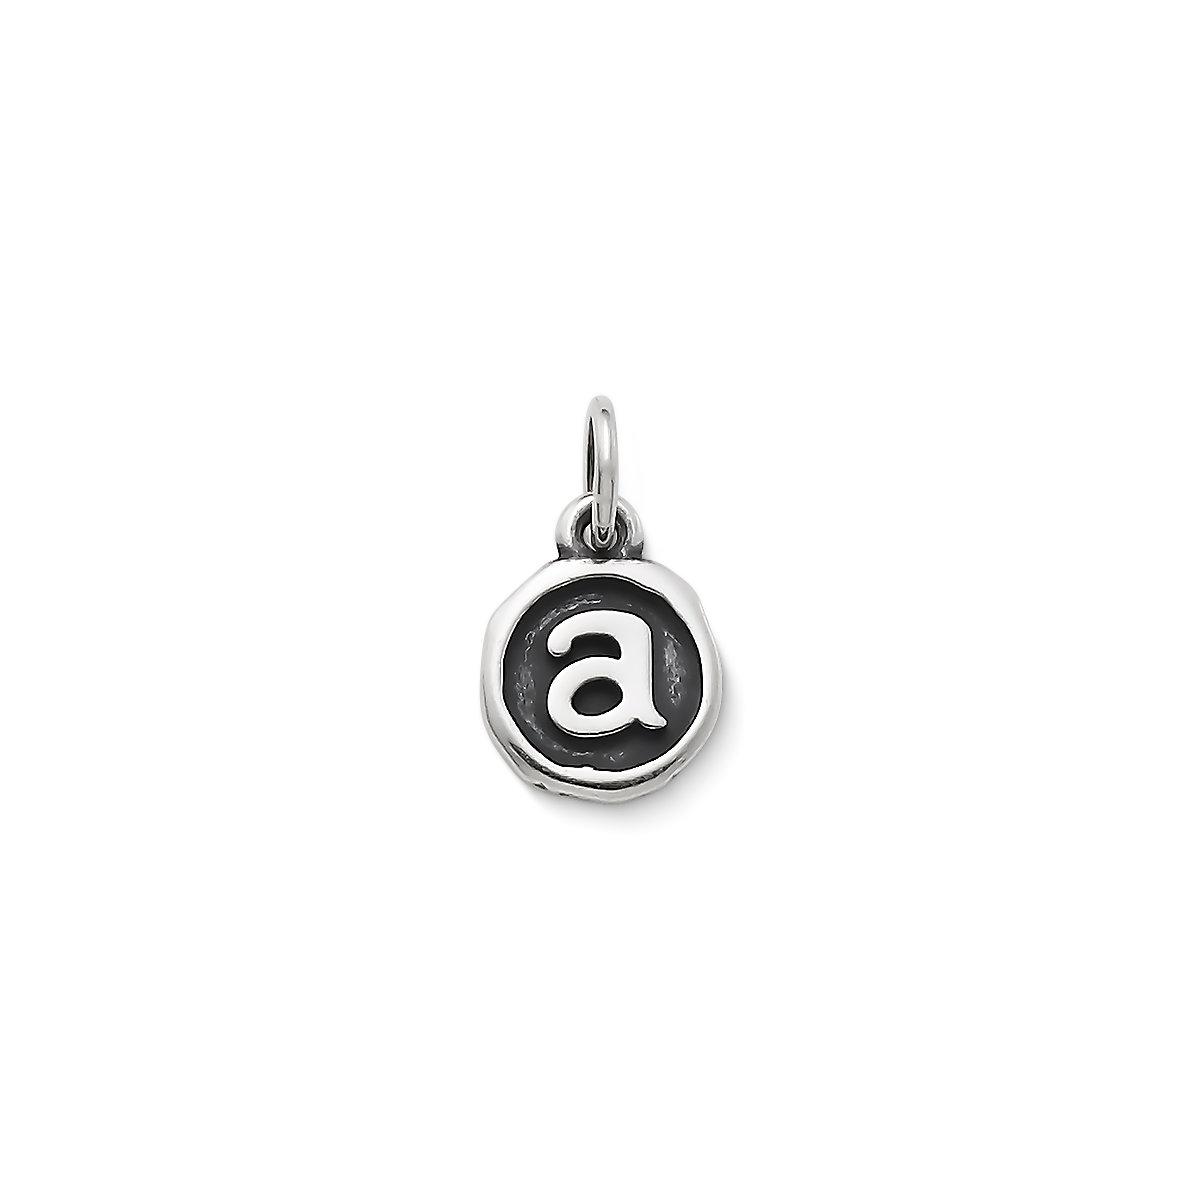 b6d0e05029c Charms: Silver, Heart , Love, Pendants & More - James Avery